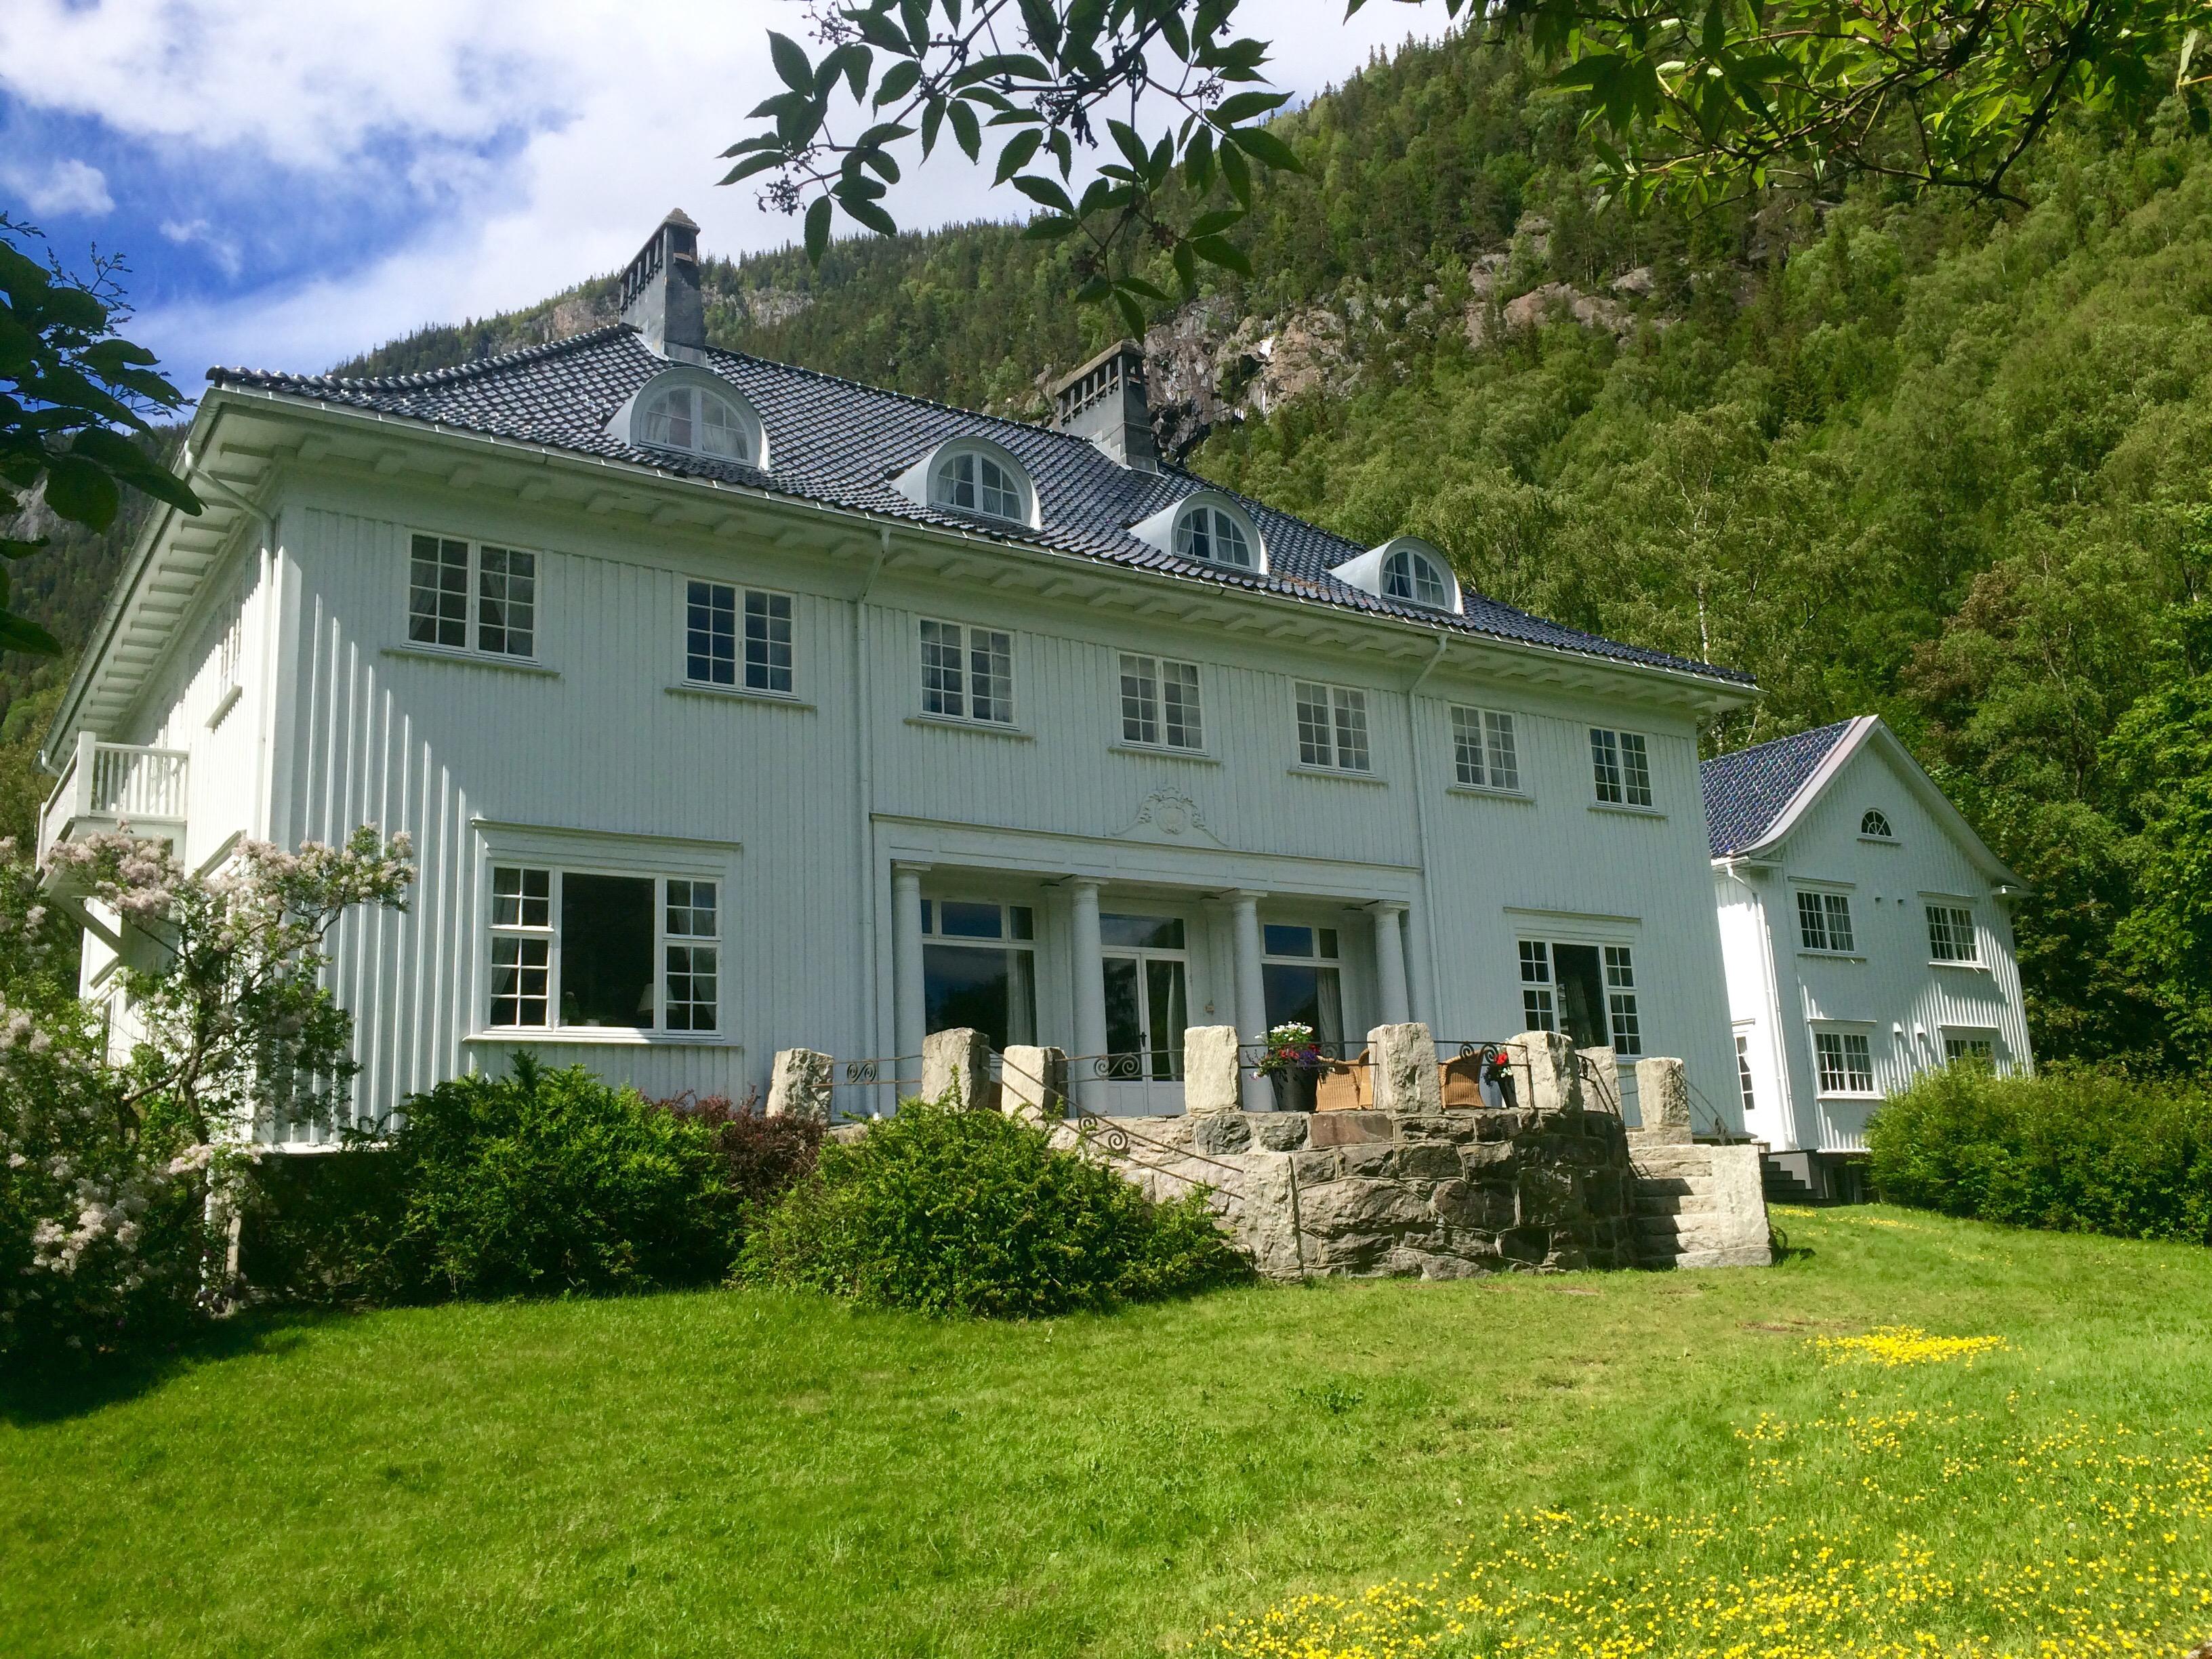 Verdensarv på Rjukan Admini Hotel